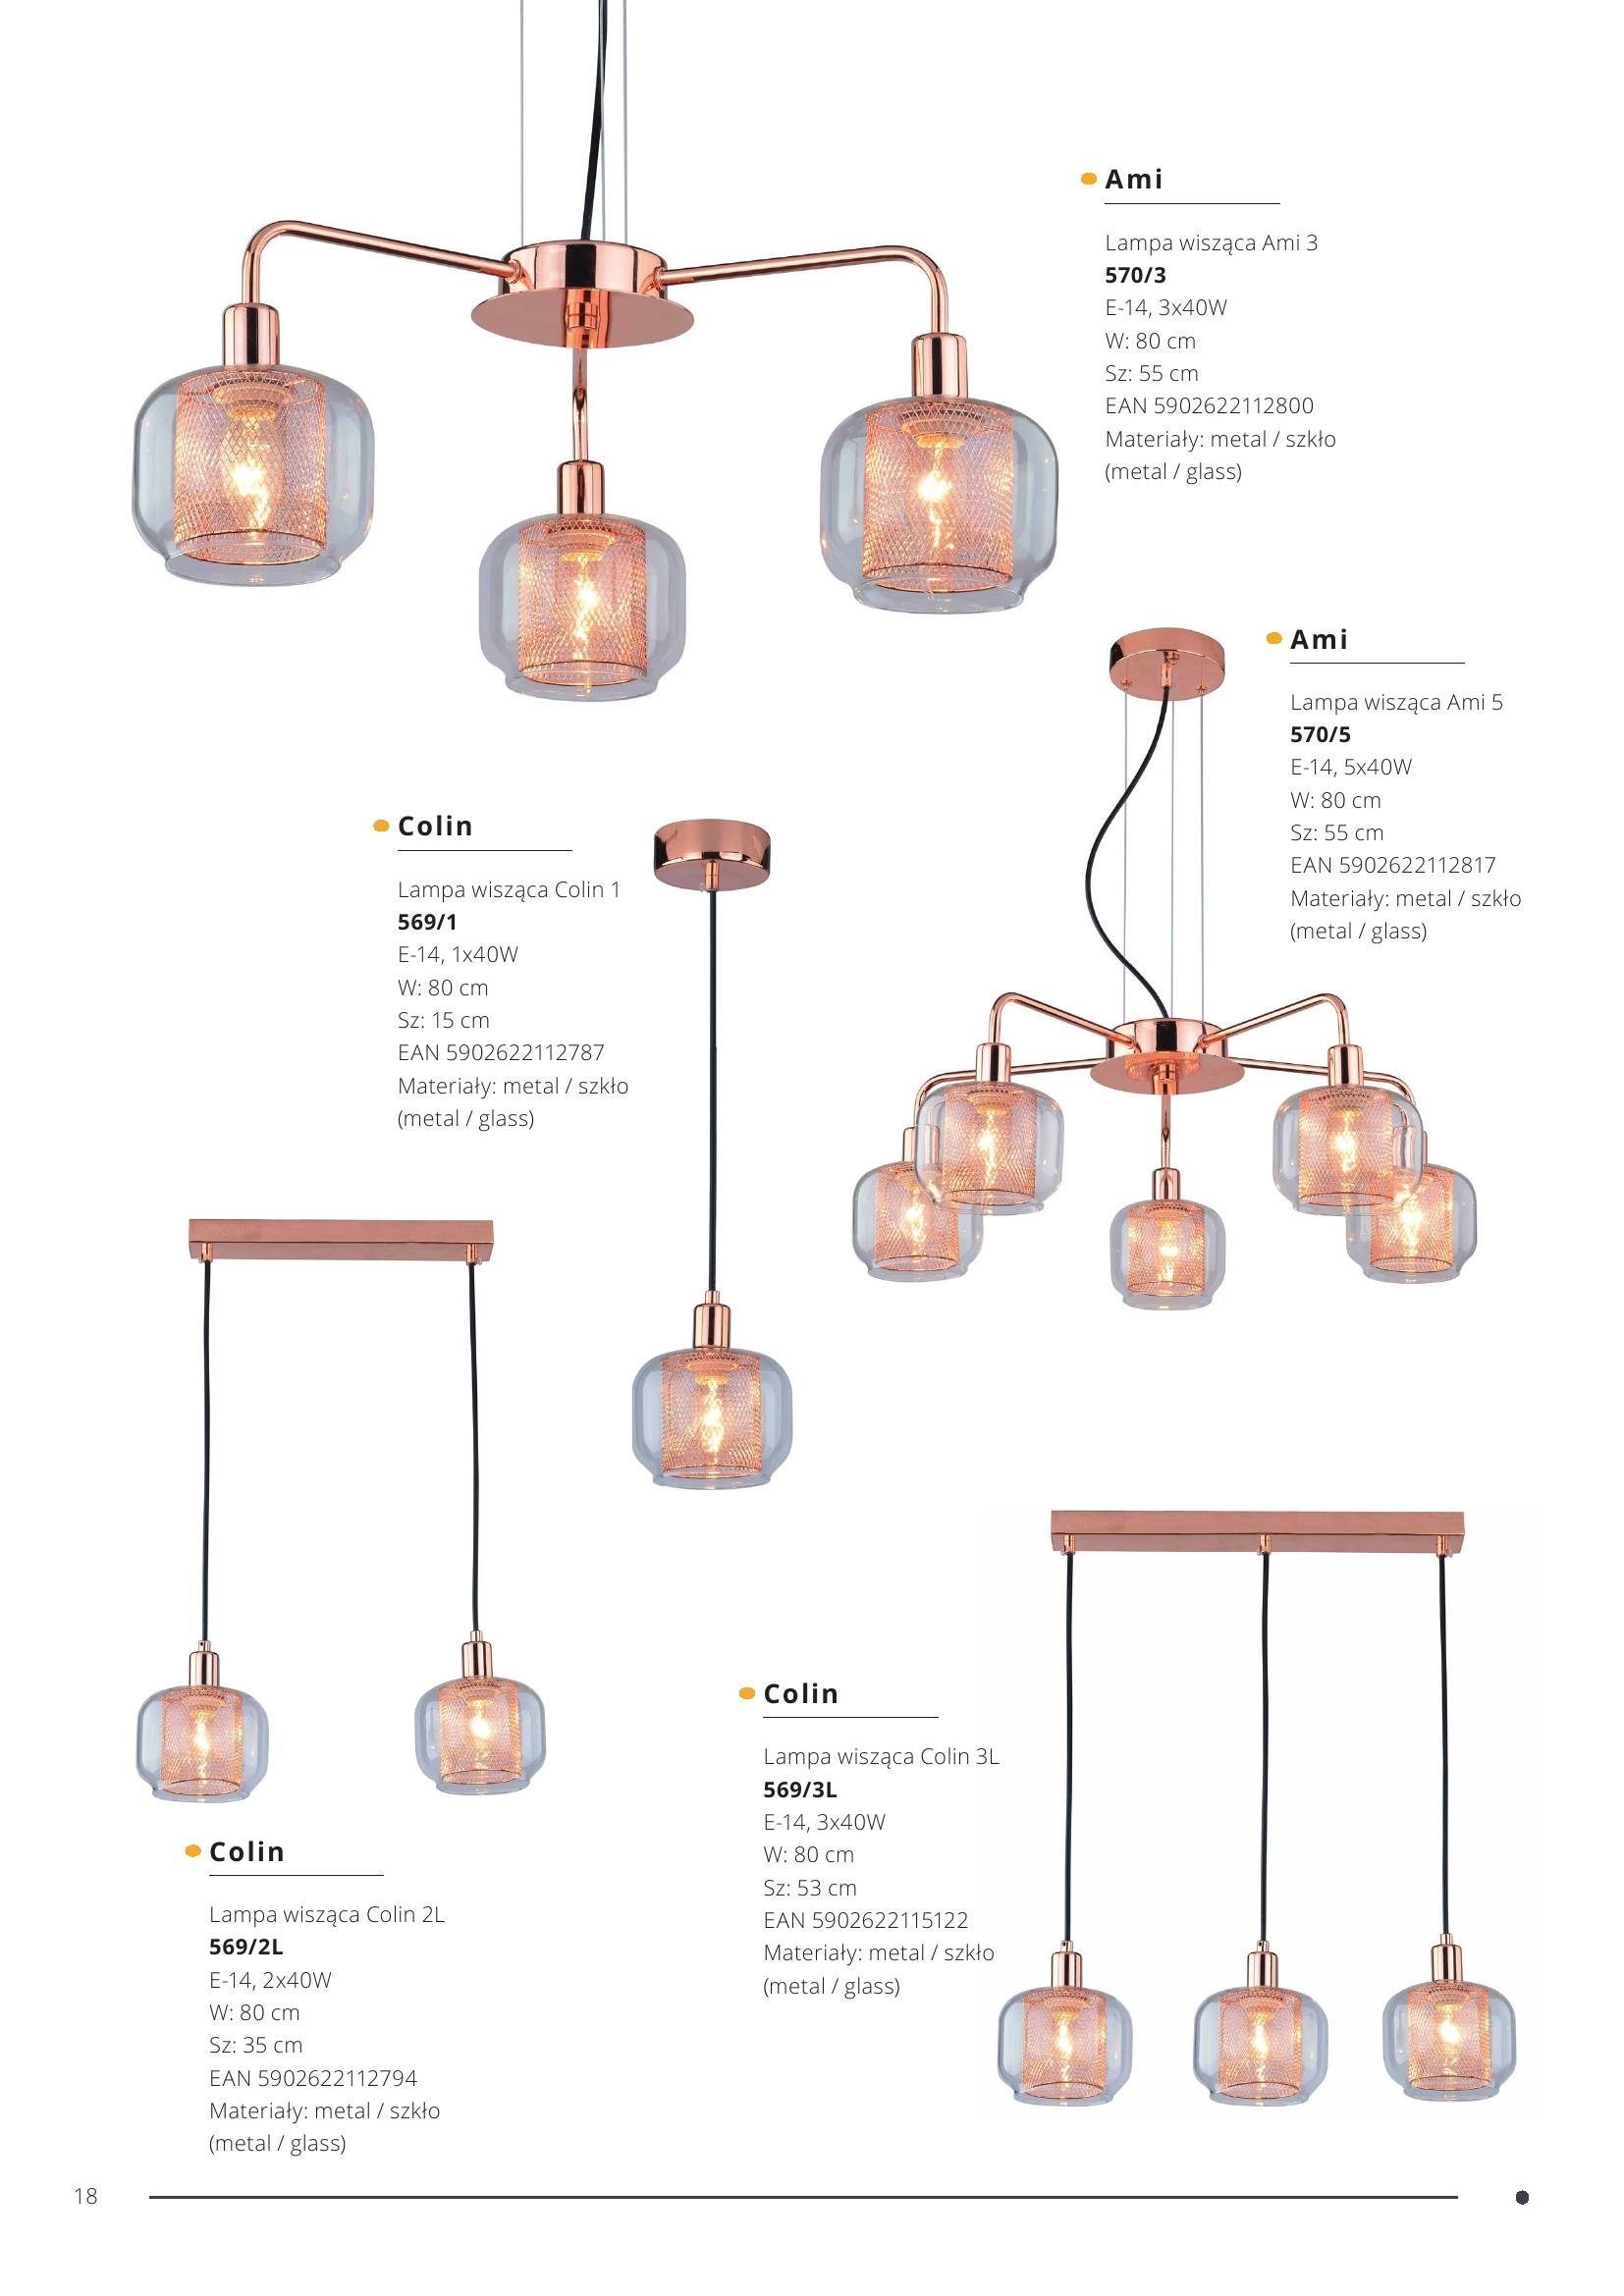 Lampa wisząca Ami 5